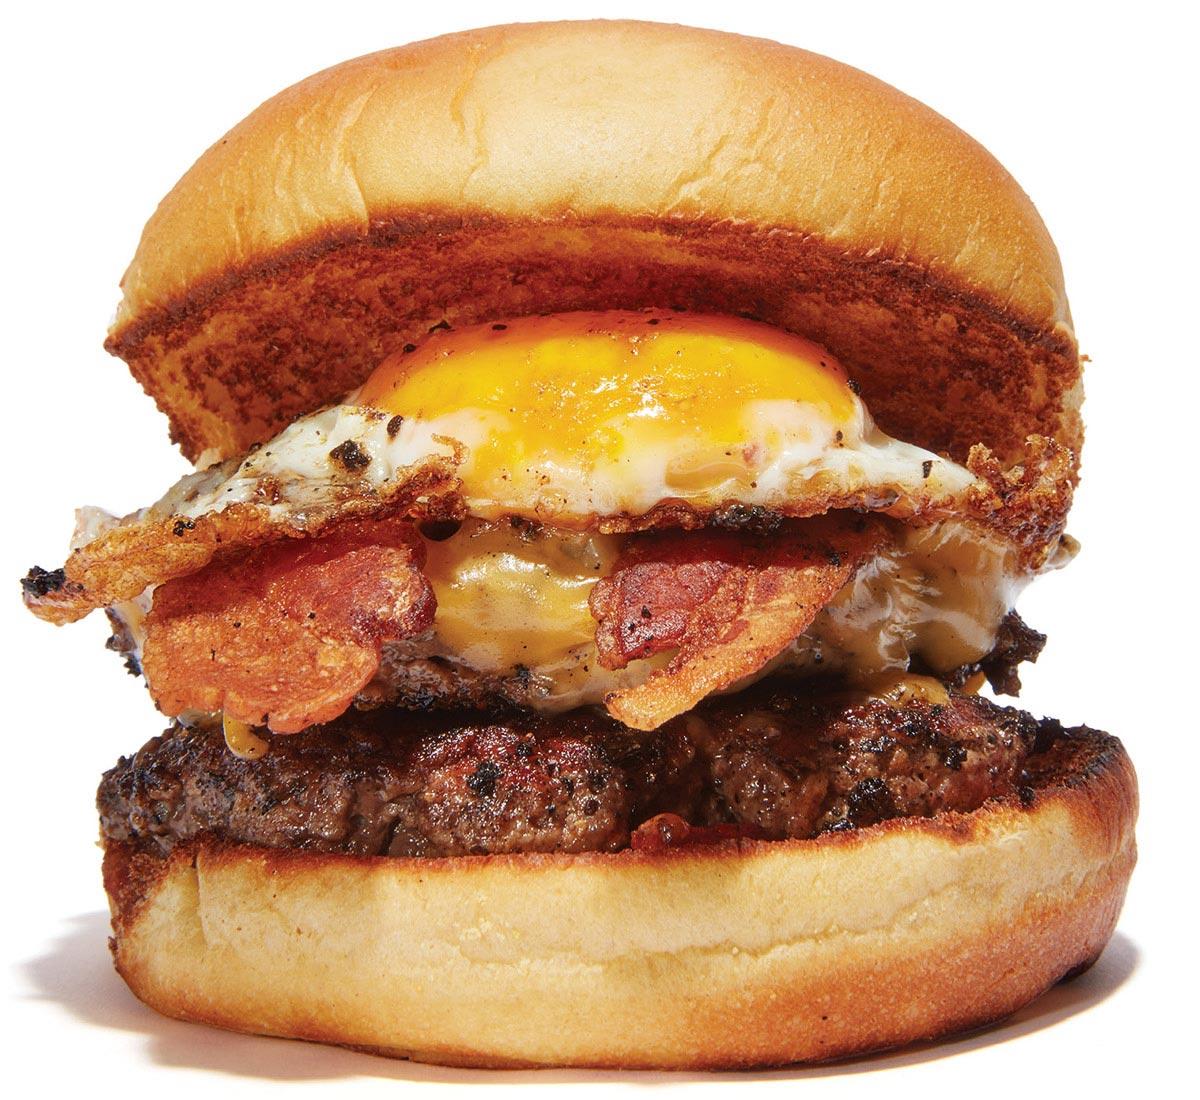 The Wheelhouse breakfast burger